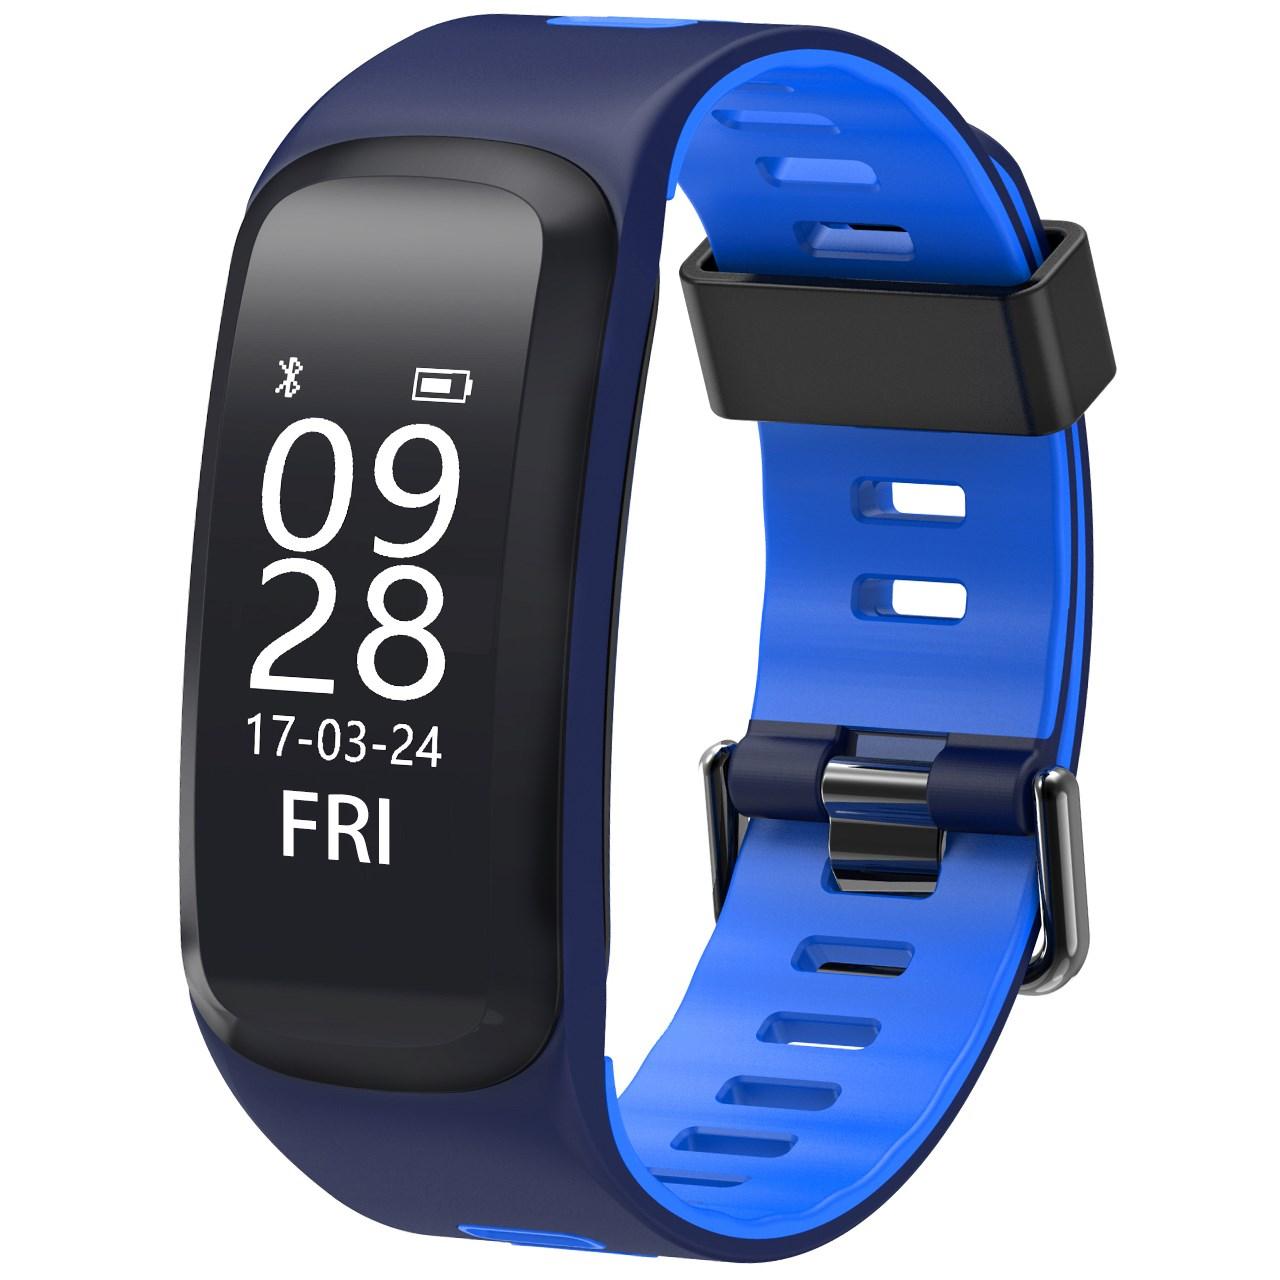 مچ بند هوشمند داتیس مدل  InFit DB-4 Blue